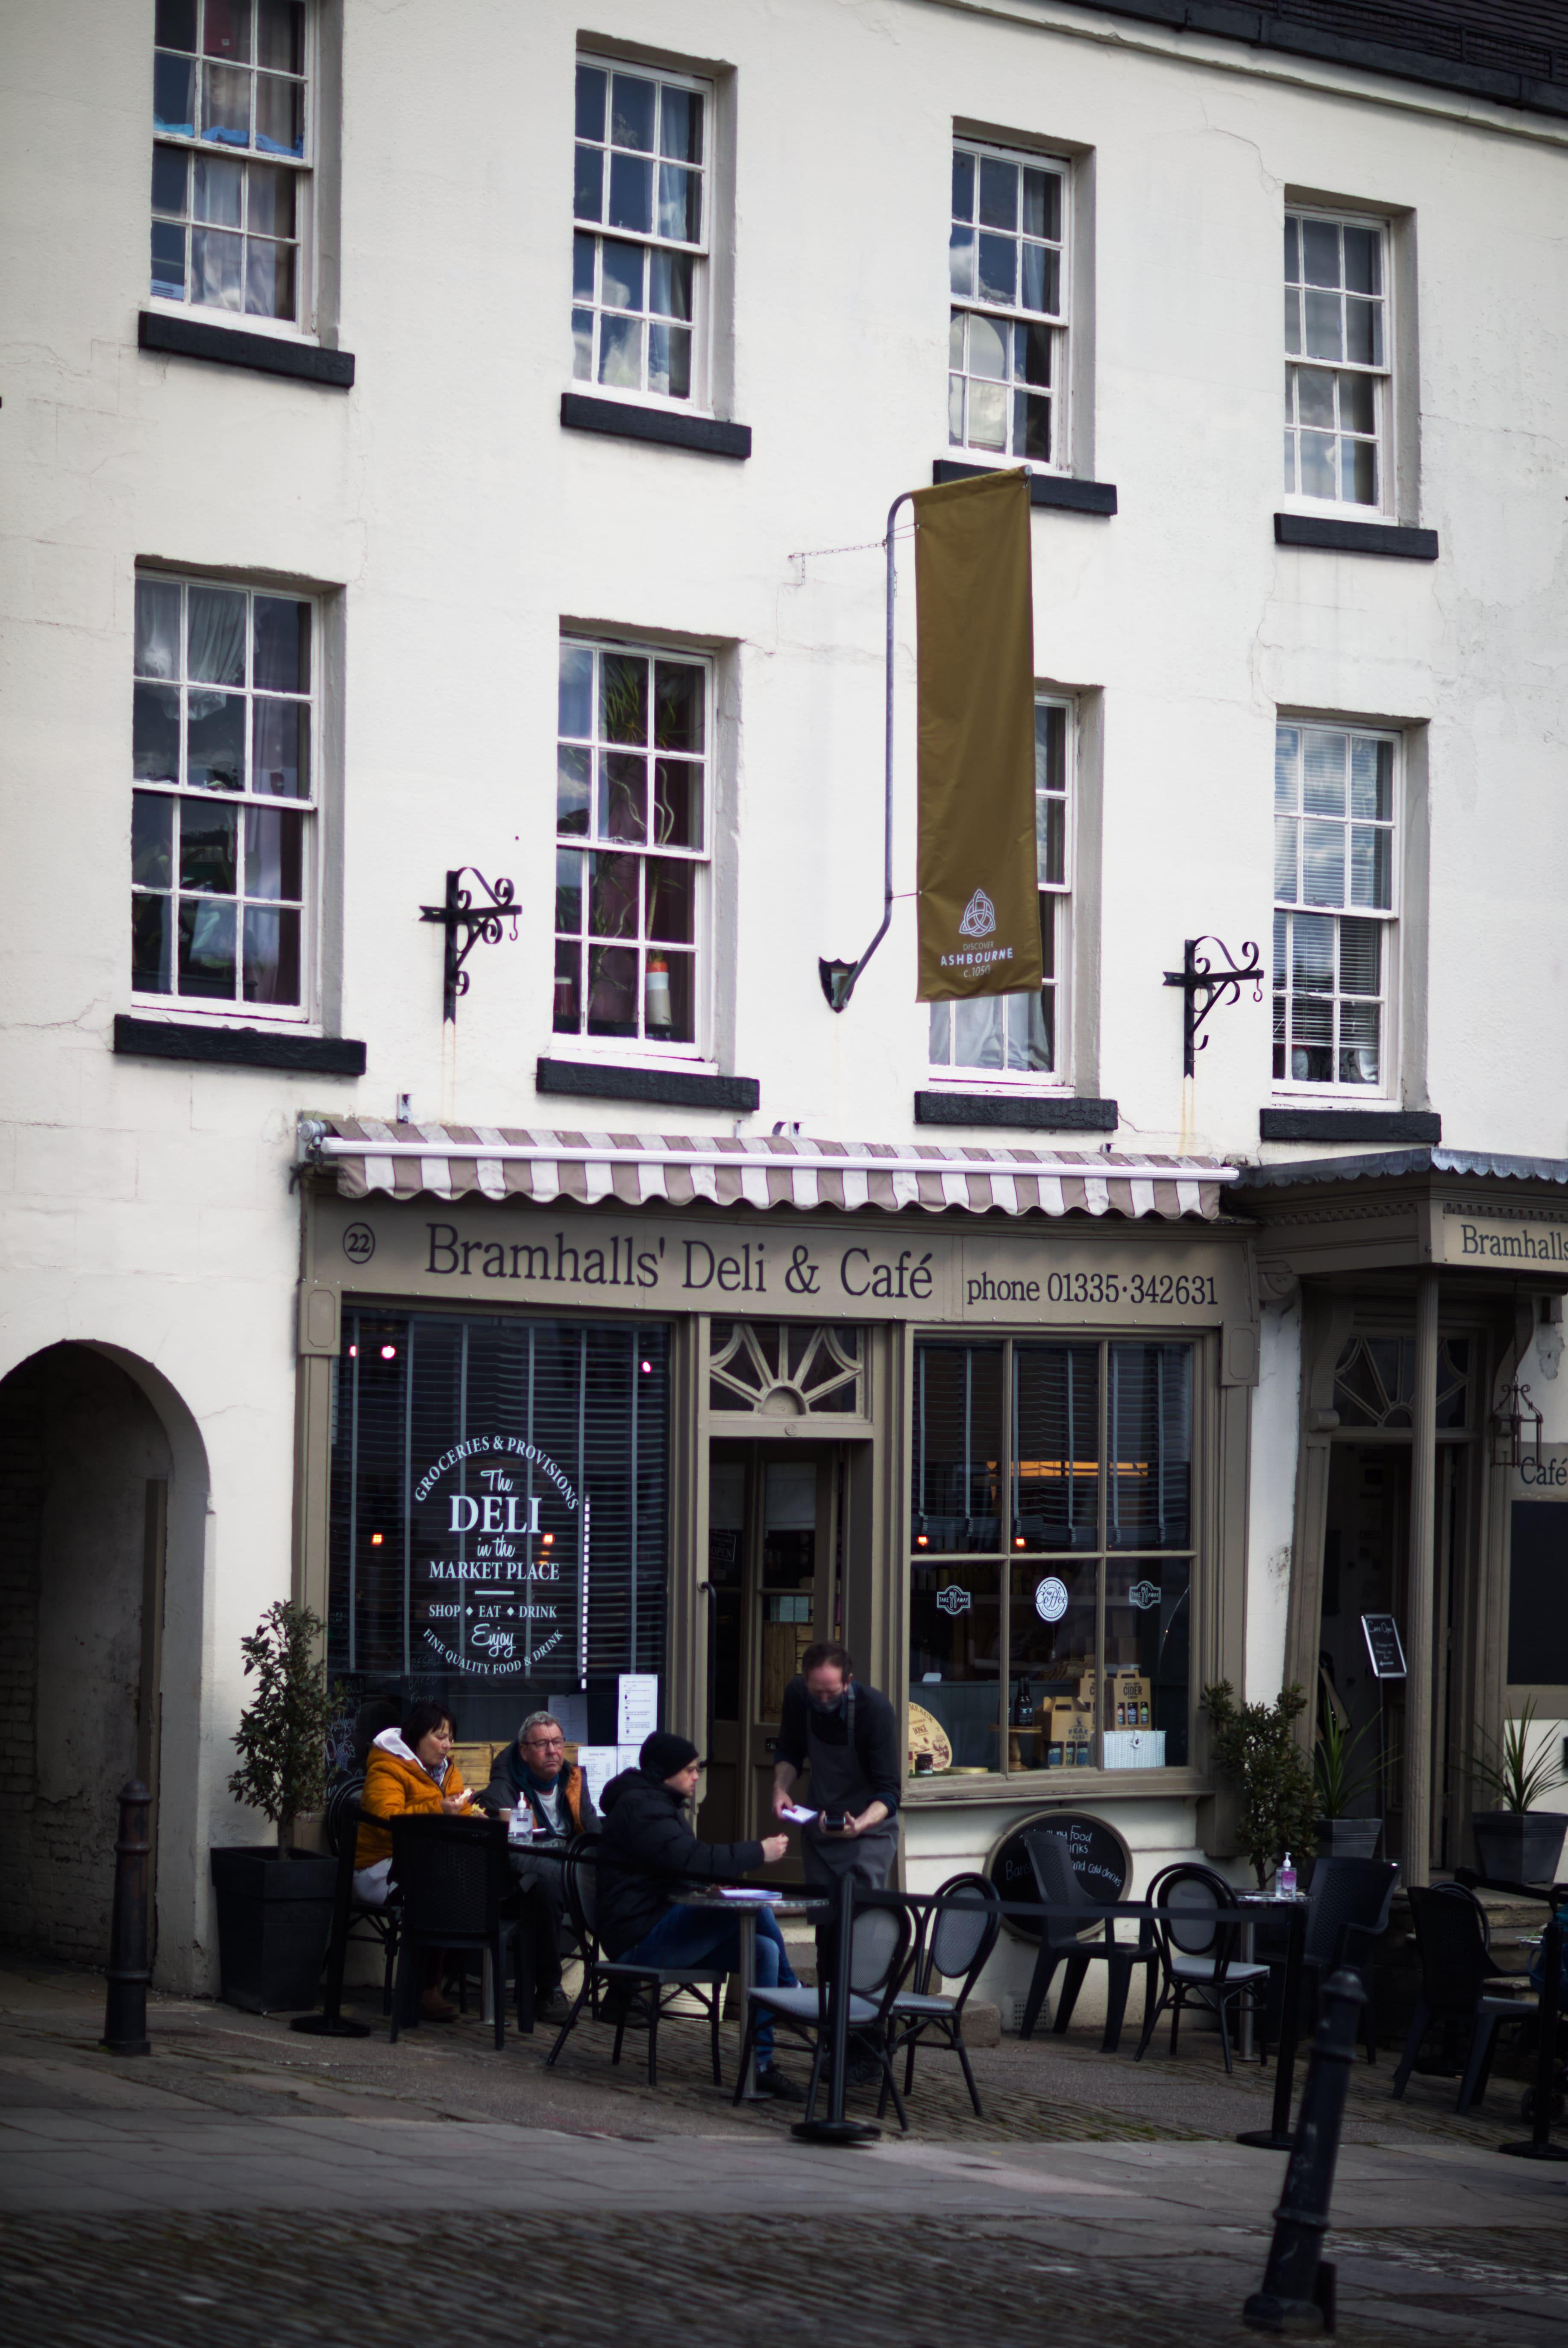 Bramhalls Deli & Cafe